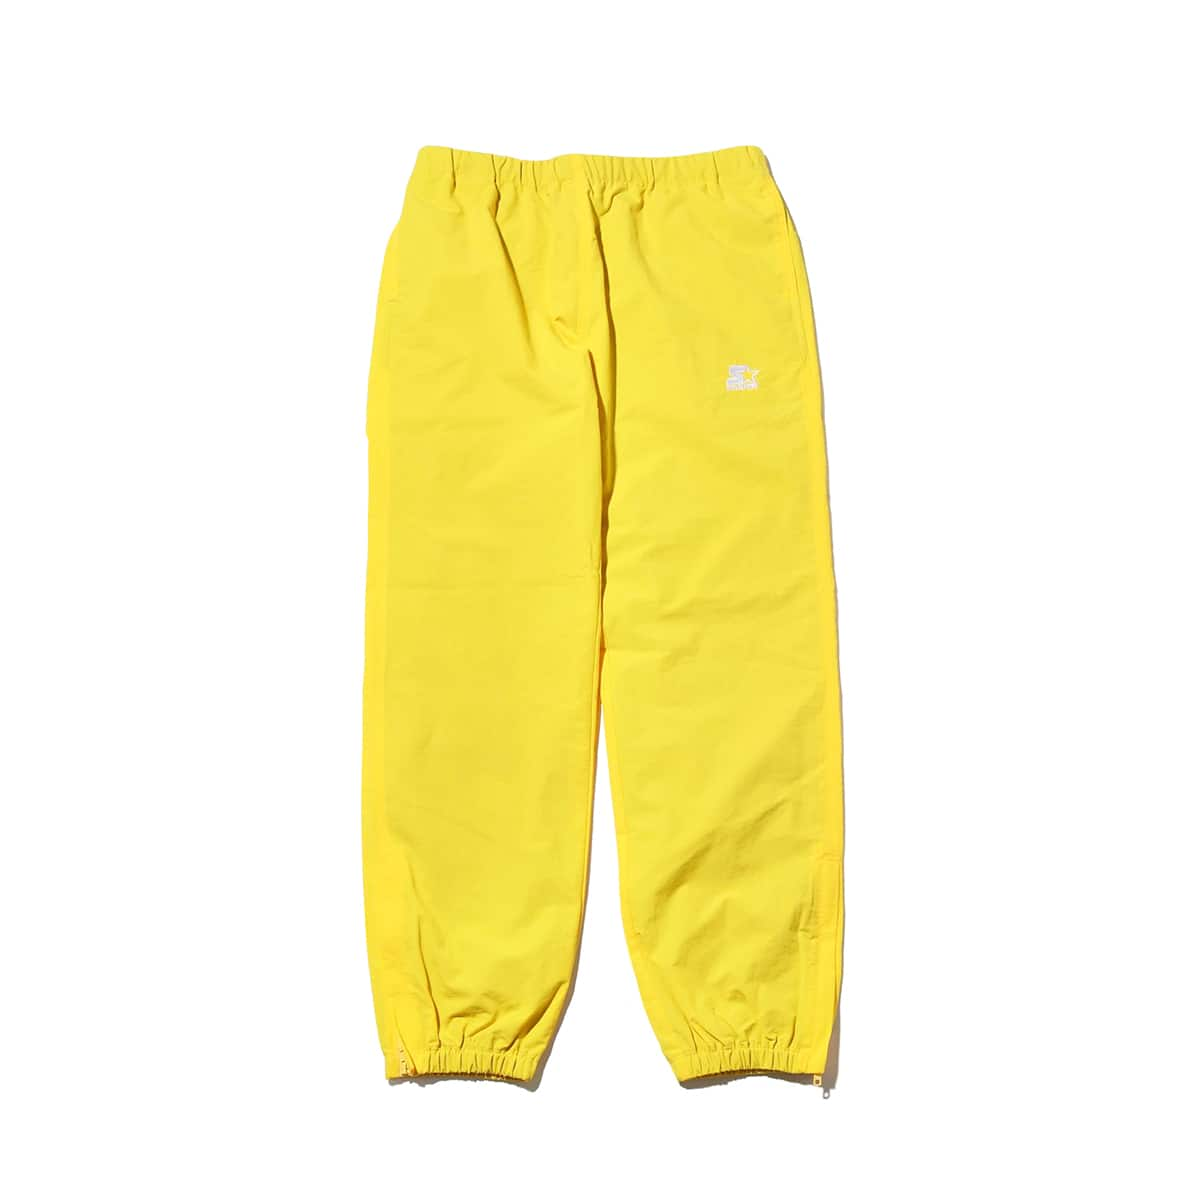 STARTER BLACK LABEL x ATMOS LAB WARM UP PANTS  yellow_photo_large